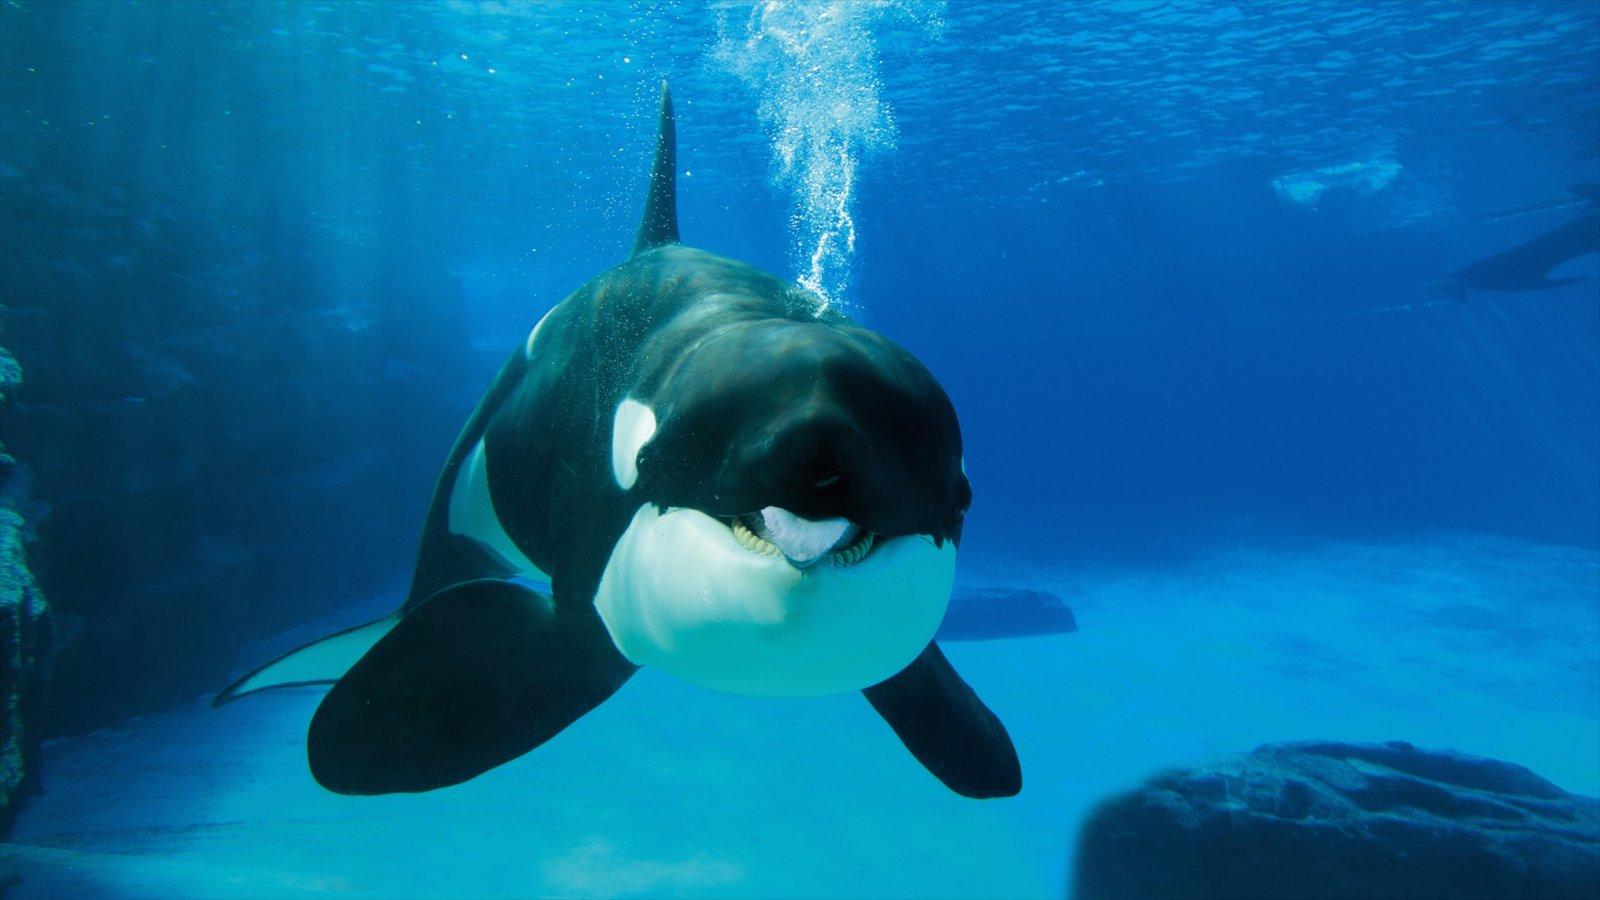 Marineland caracterizando vida marinha, passeios e animais de zoológico